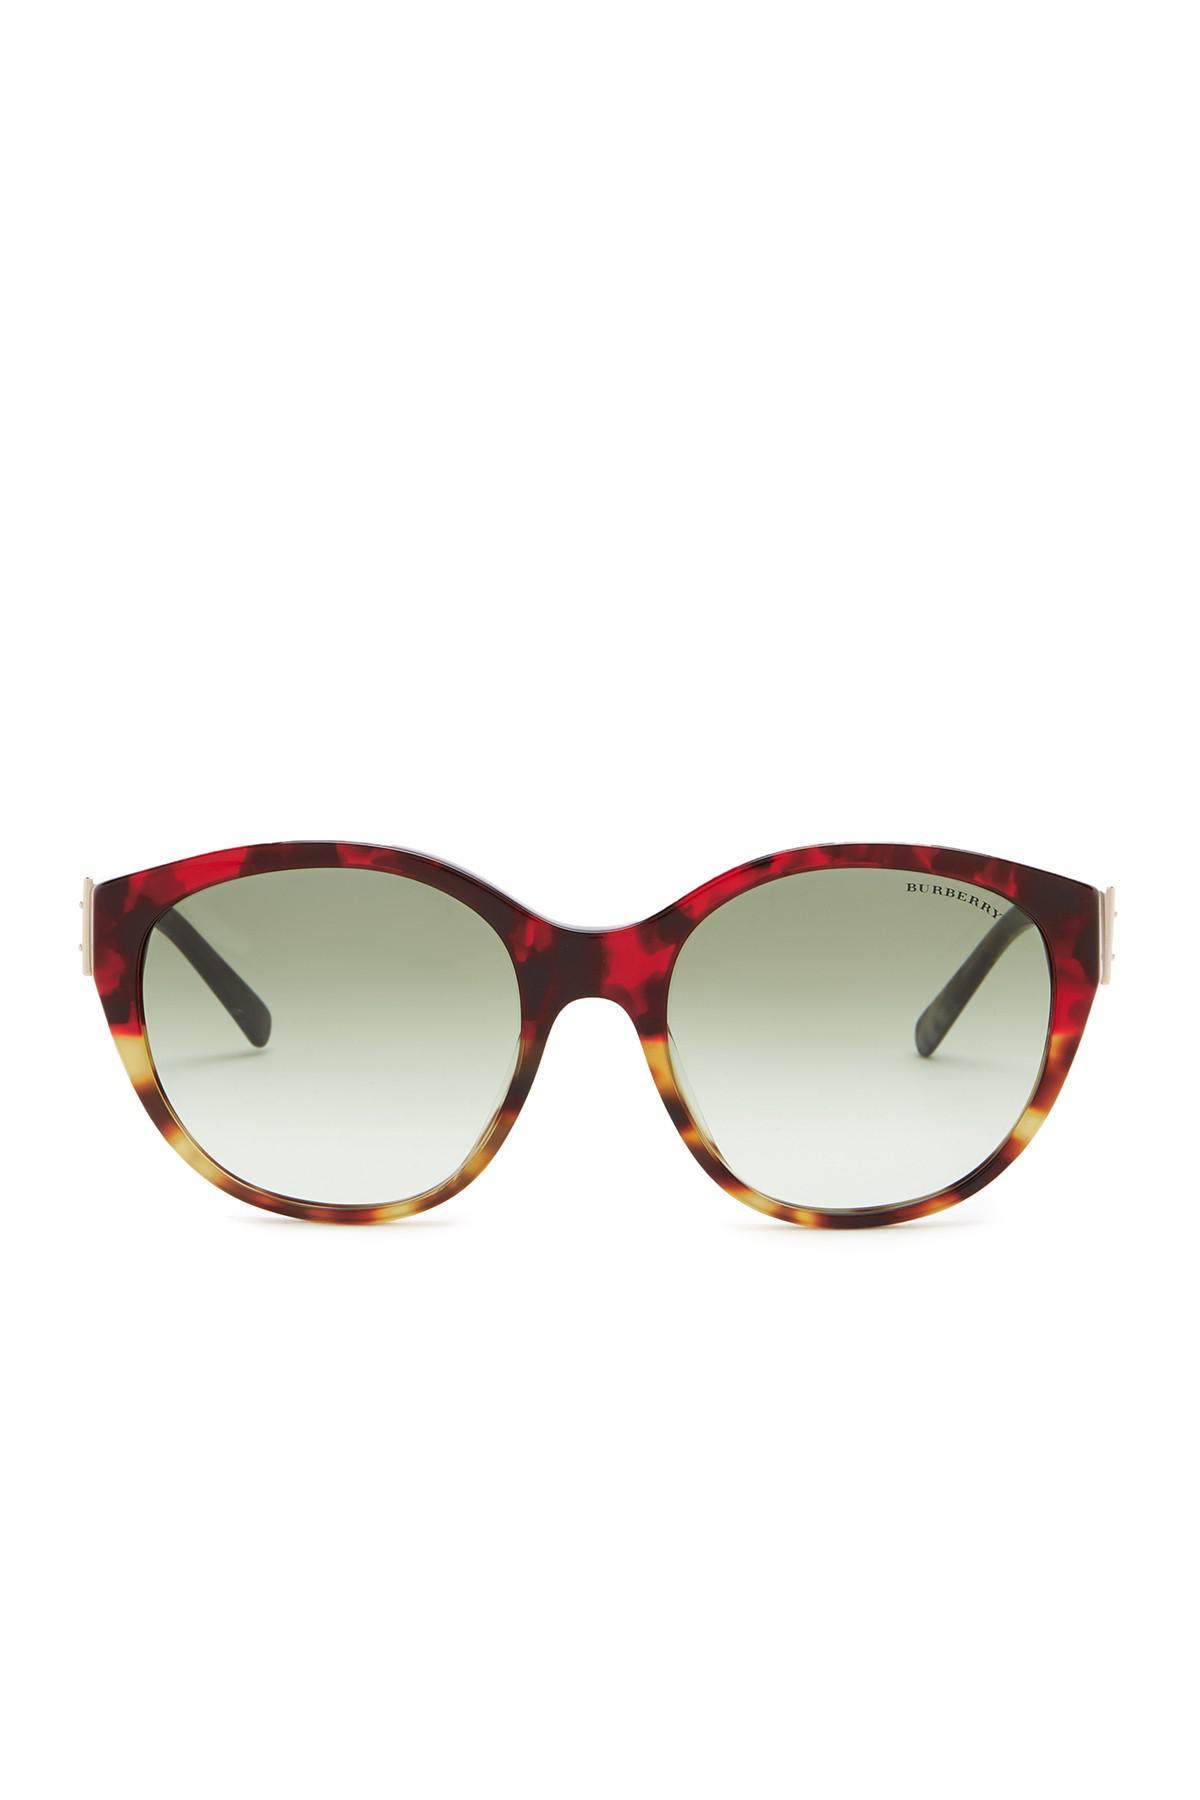 07e11d14d2fe Burberry - Multicolor 55mm Round Sunglasses - Lyst. View fullscreen